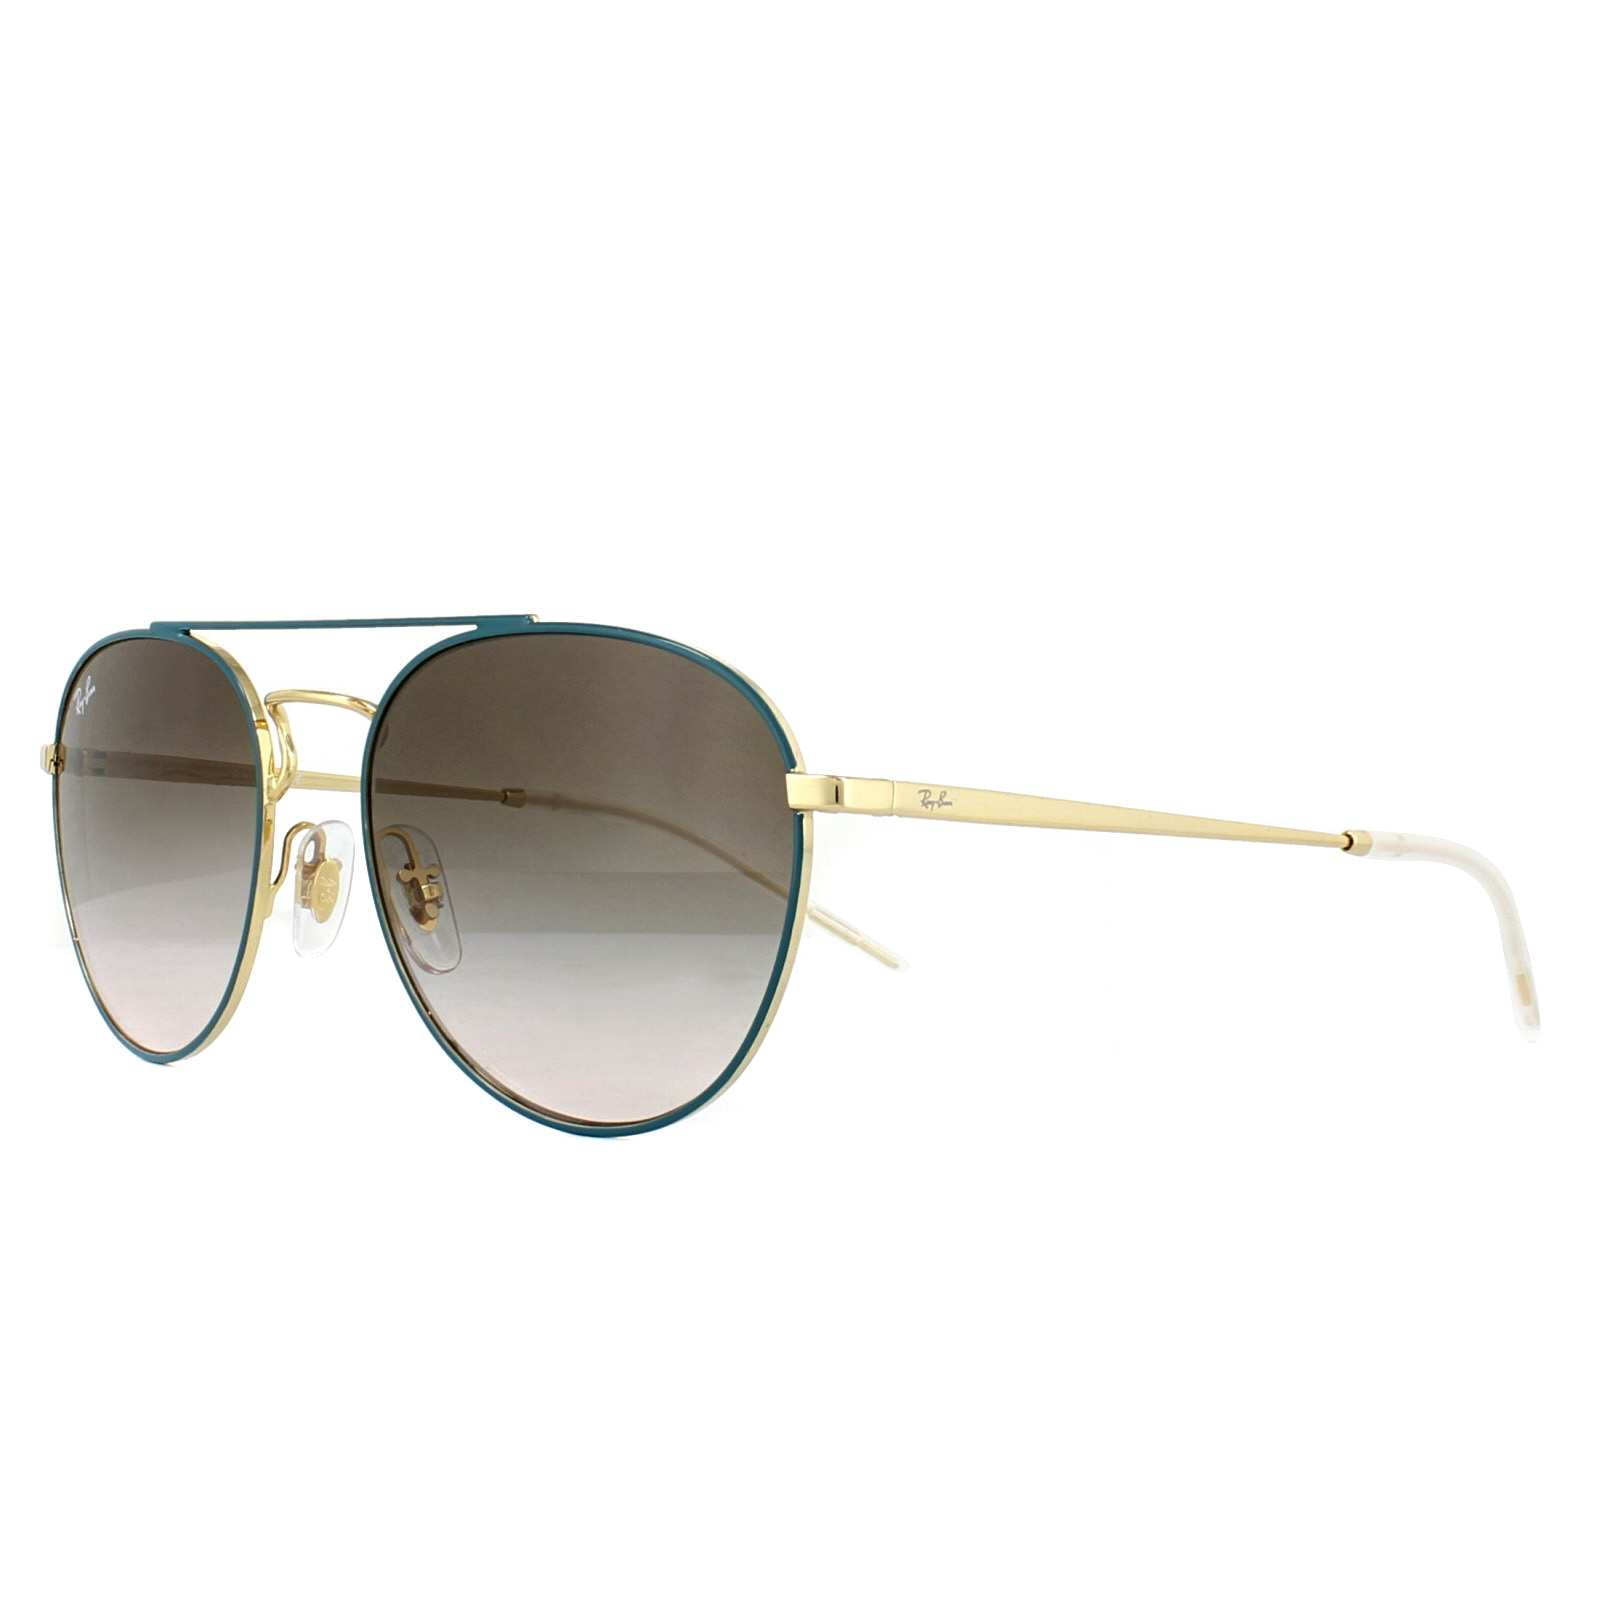 2ffbddf2e2 Sentinel Ray-Ban Sunglasses 3589 905613 Green Gold Brown Gradient